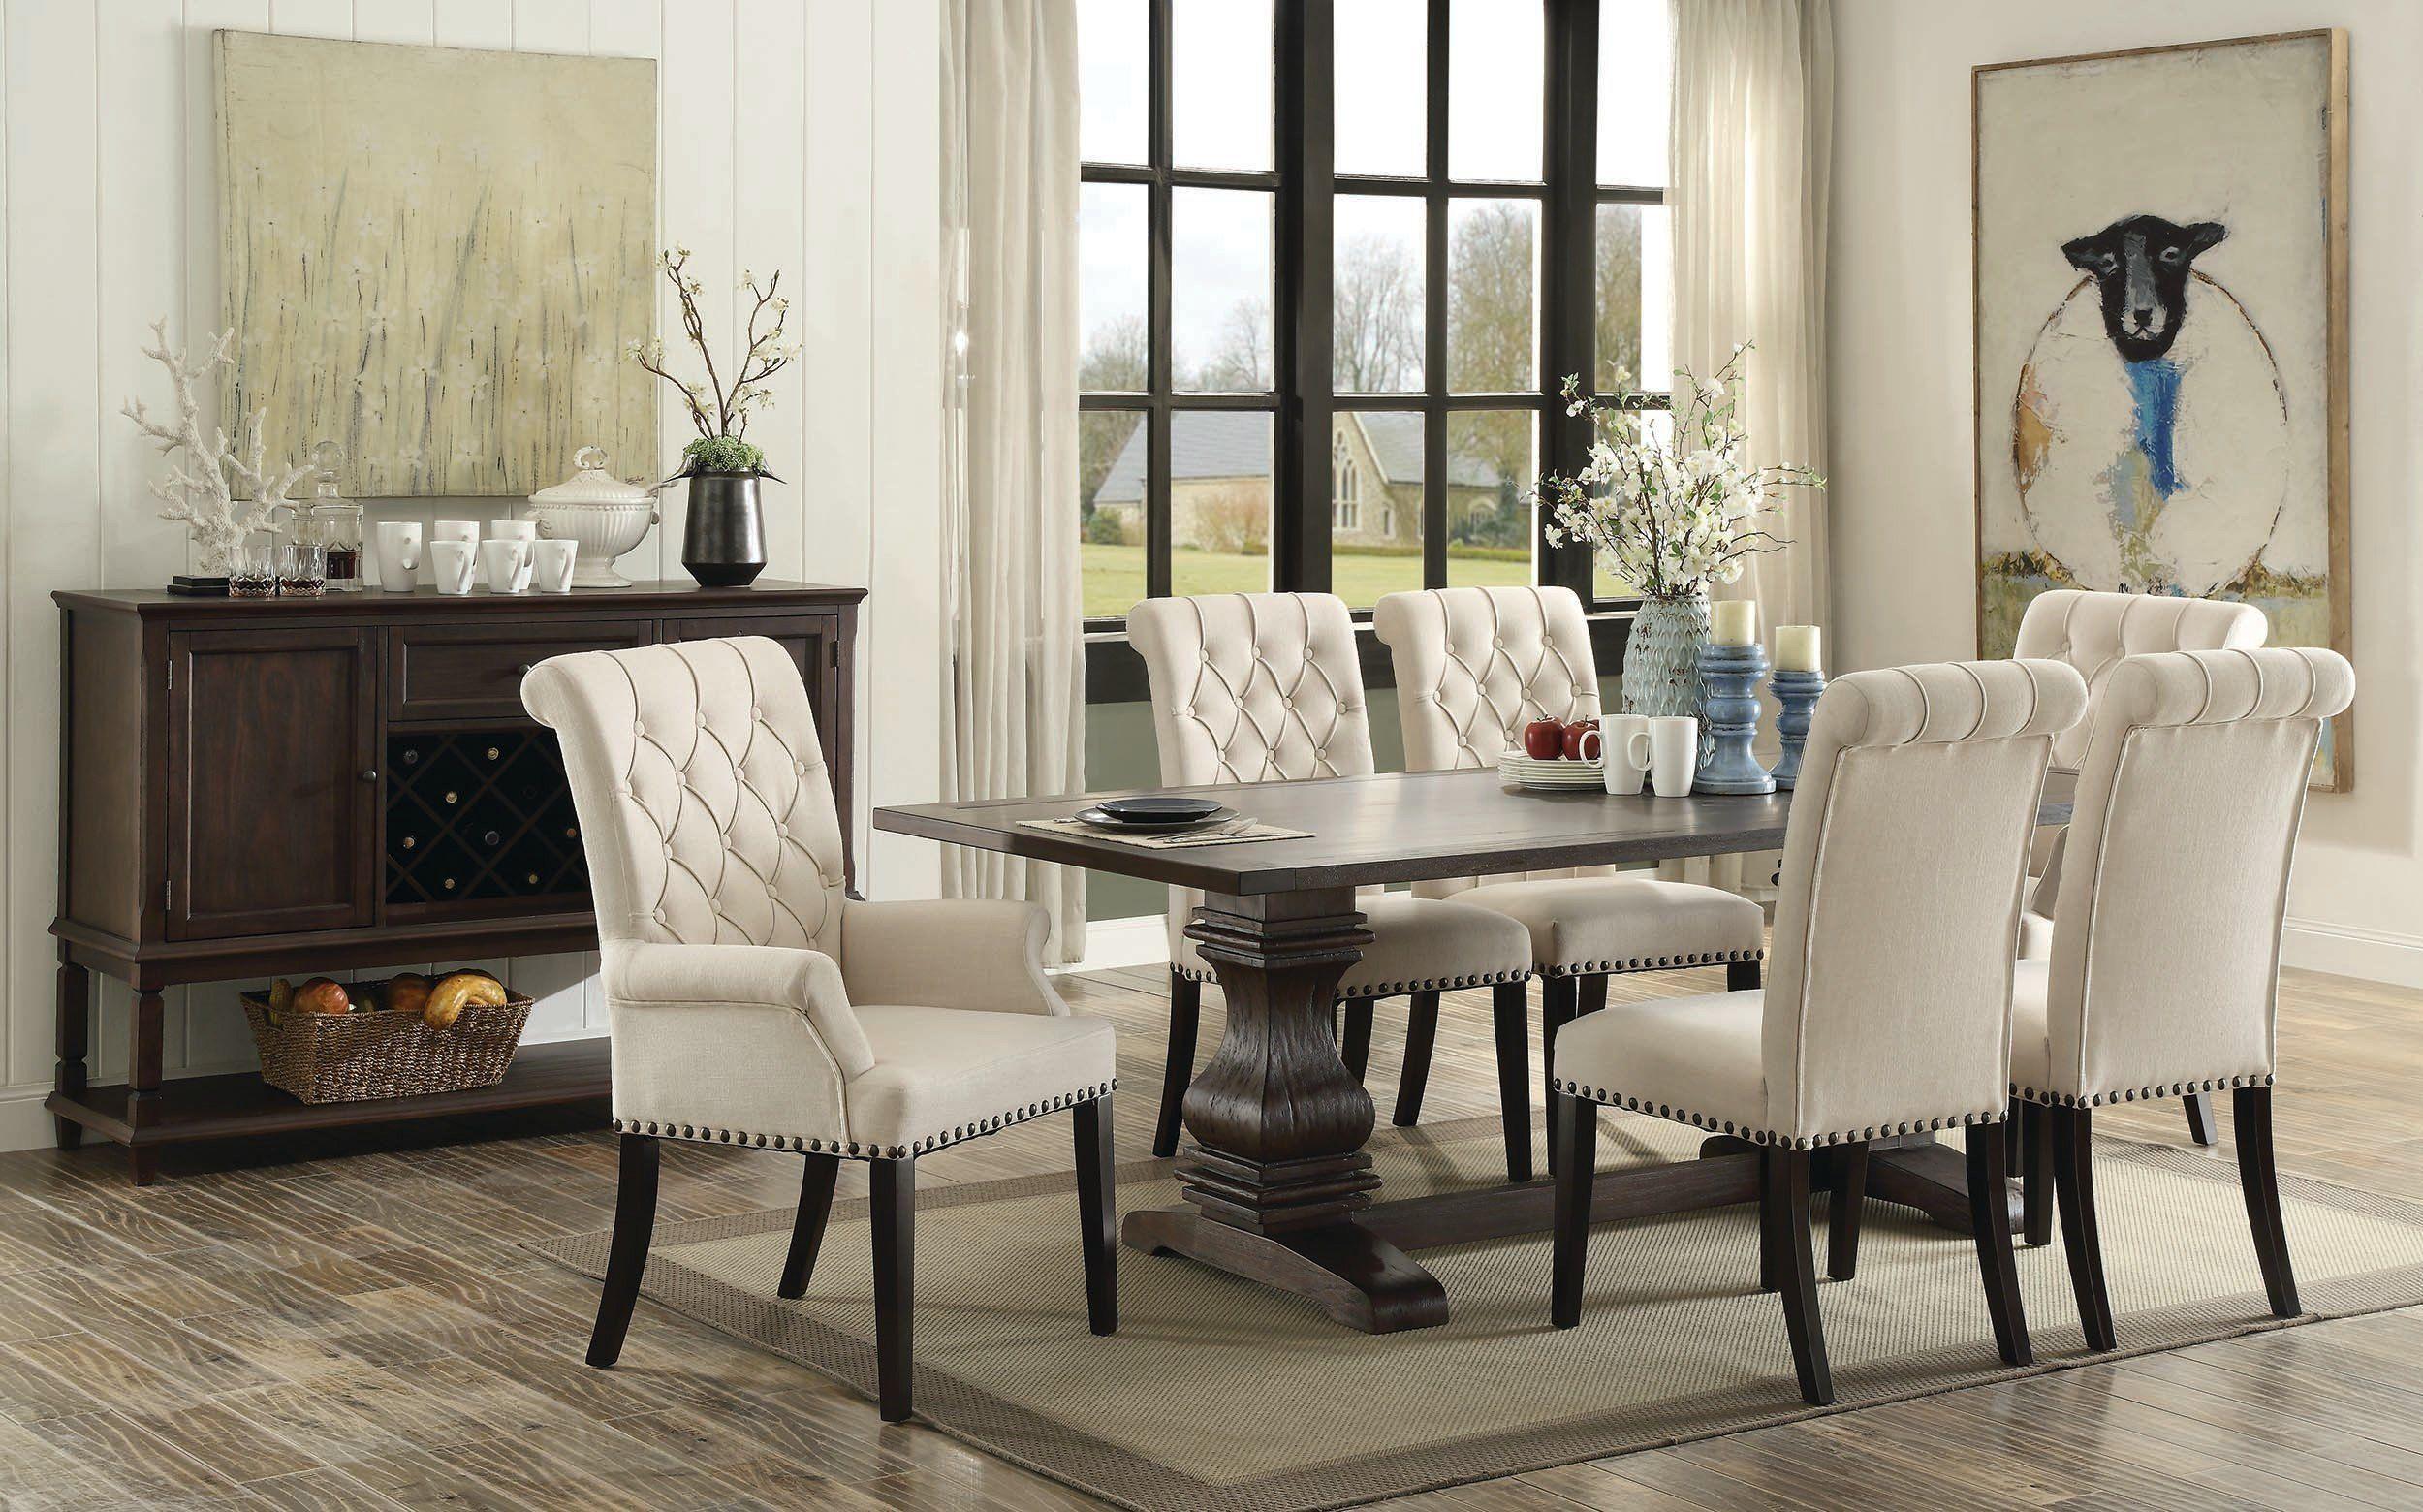 Parkins Rustic Espresso 8 Piece Rectangular Dining Table Set